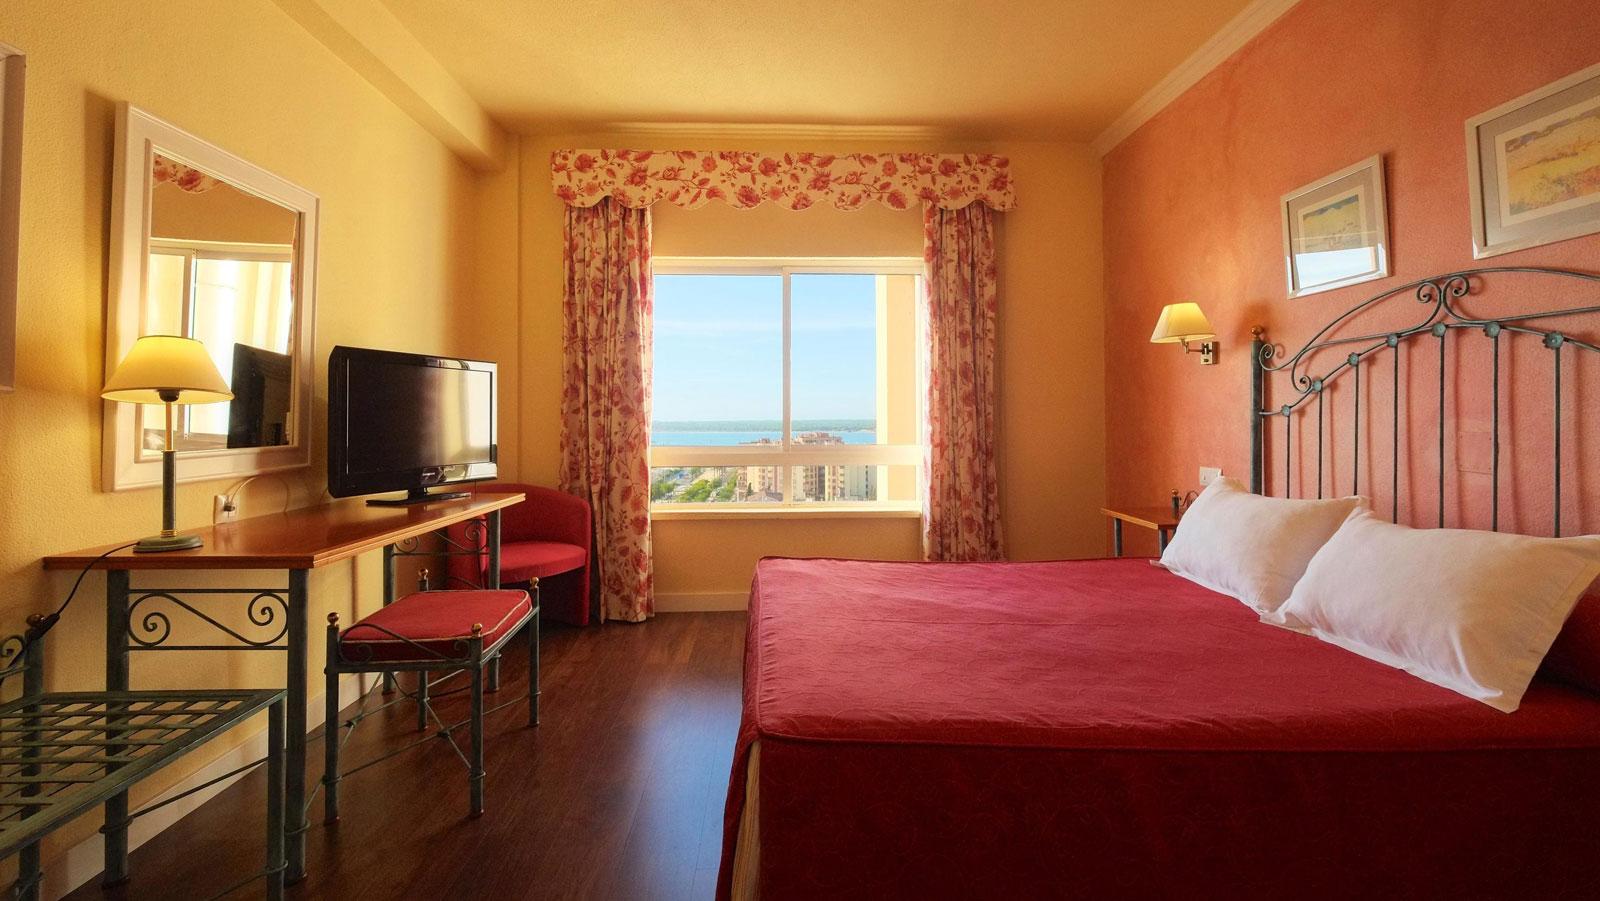 Zimmer Hotel Guadalquivir